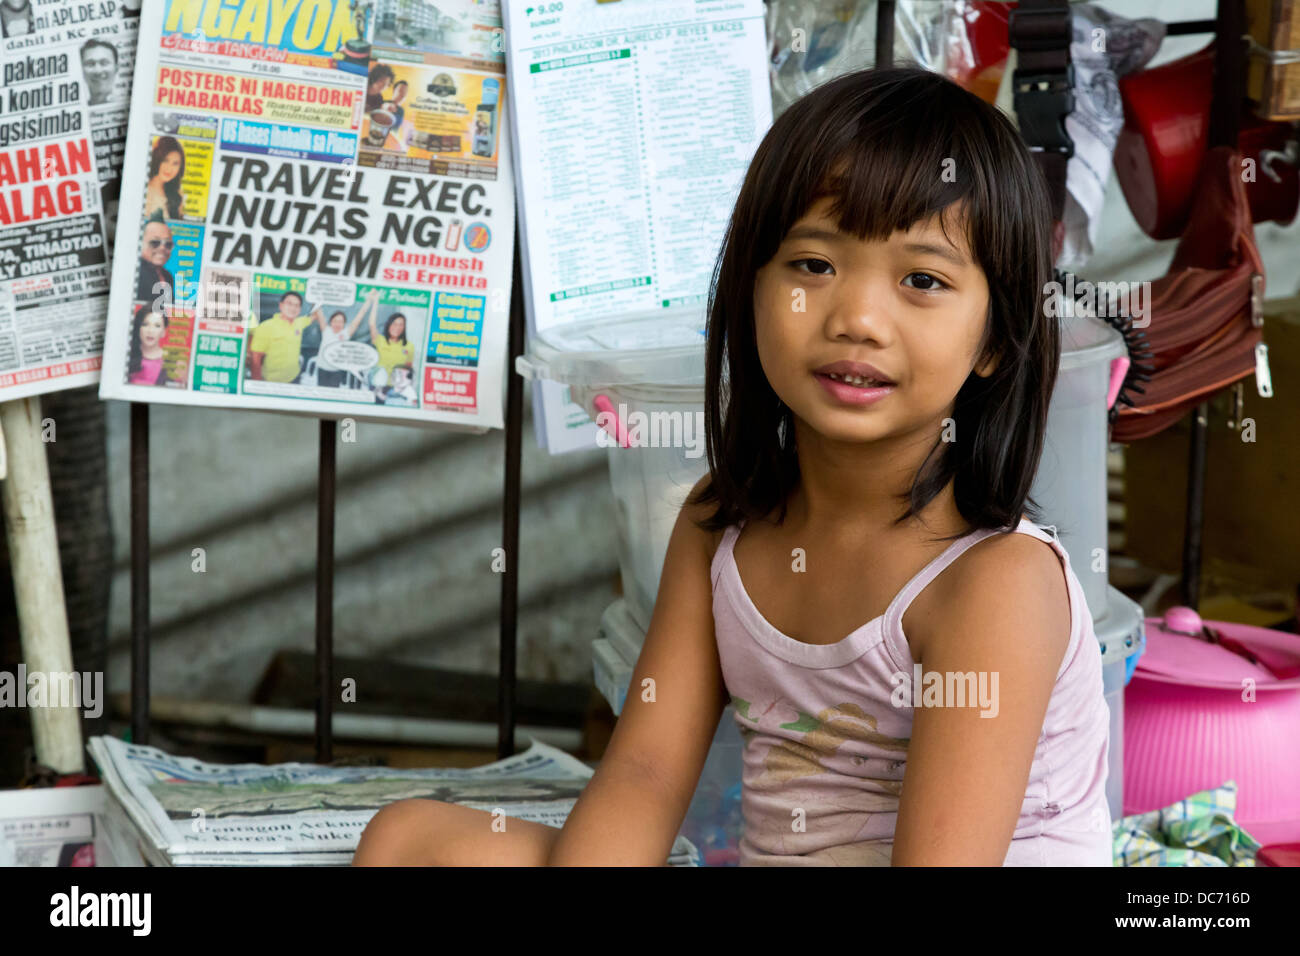 Manila girl pic 88